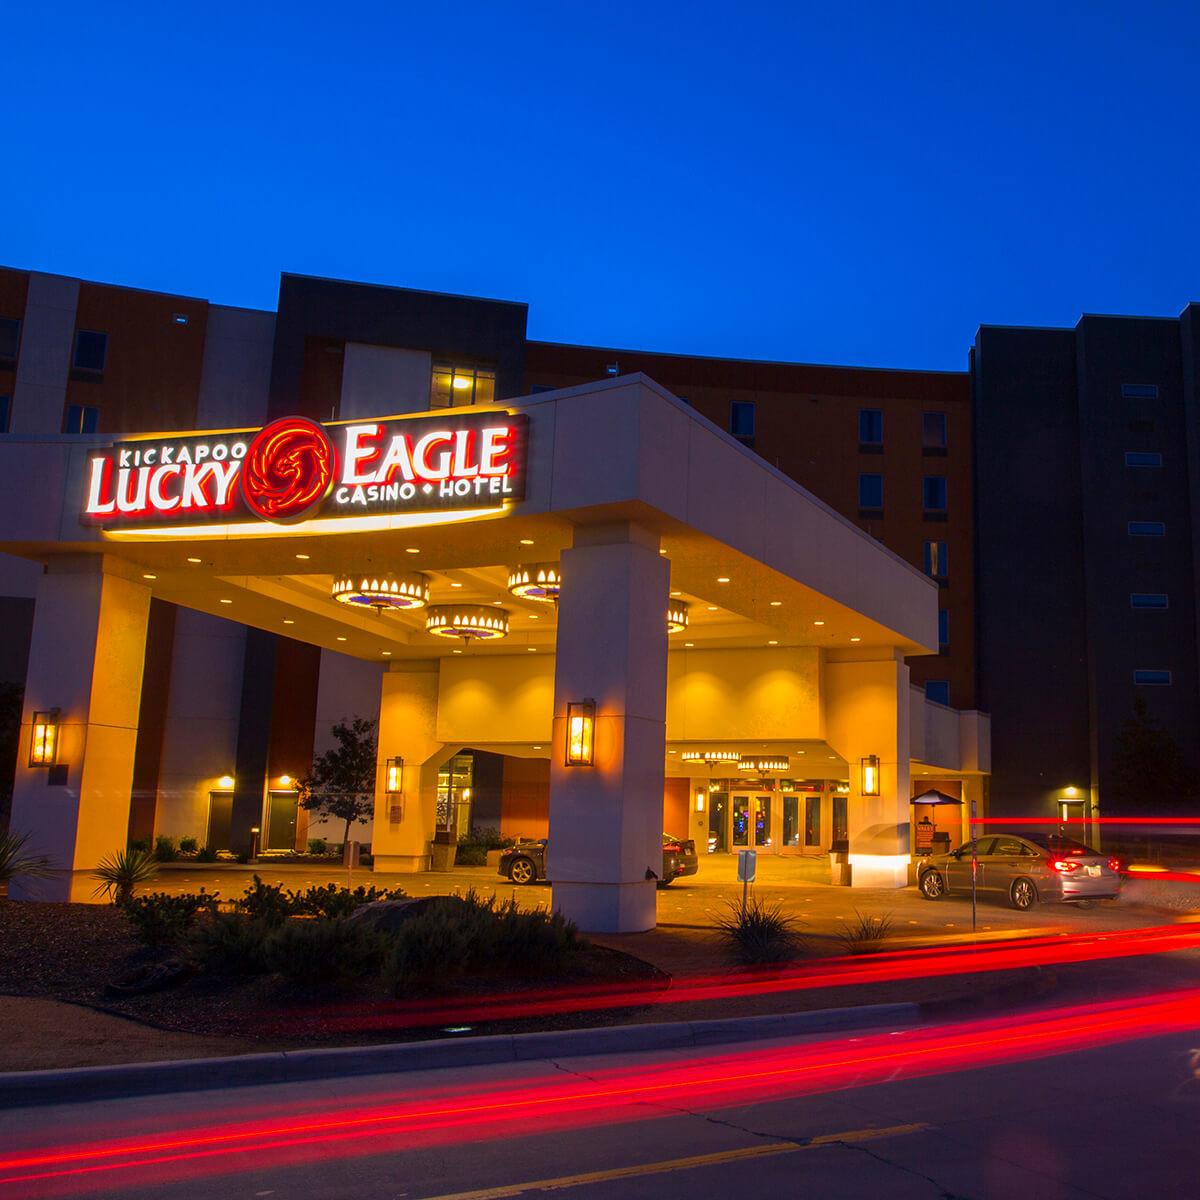 Kickapoo Lucky Eagle Casino exterior